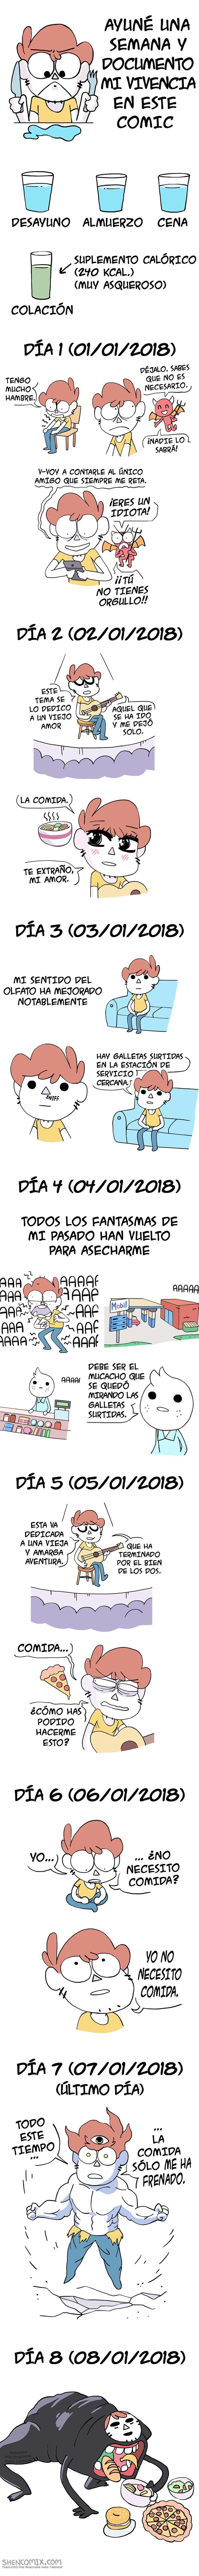 en un comic se relata la dieta durante toda una semana